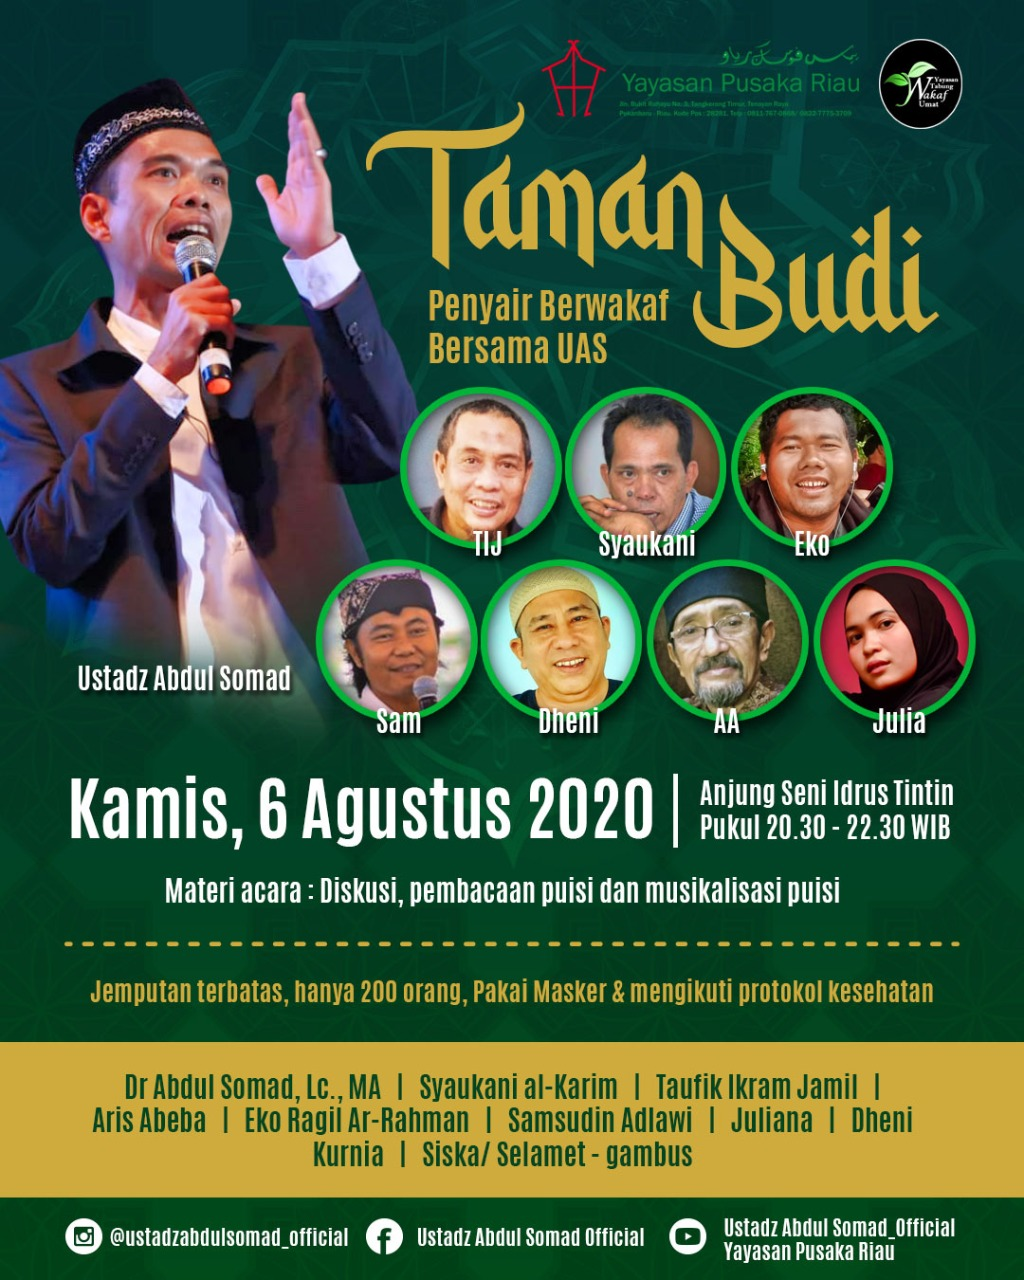 Ustadz Kondang Asal Riau Ini Merindukan Penyair, Saksikan Penyair Berwakaf Bersama UAS